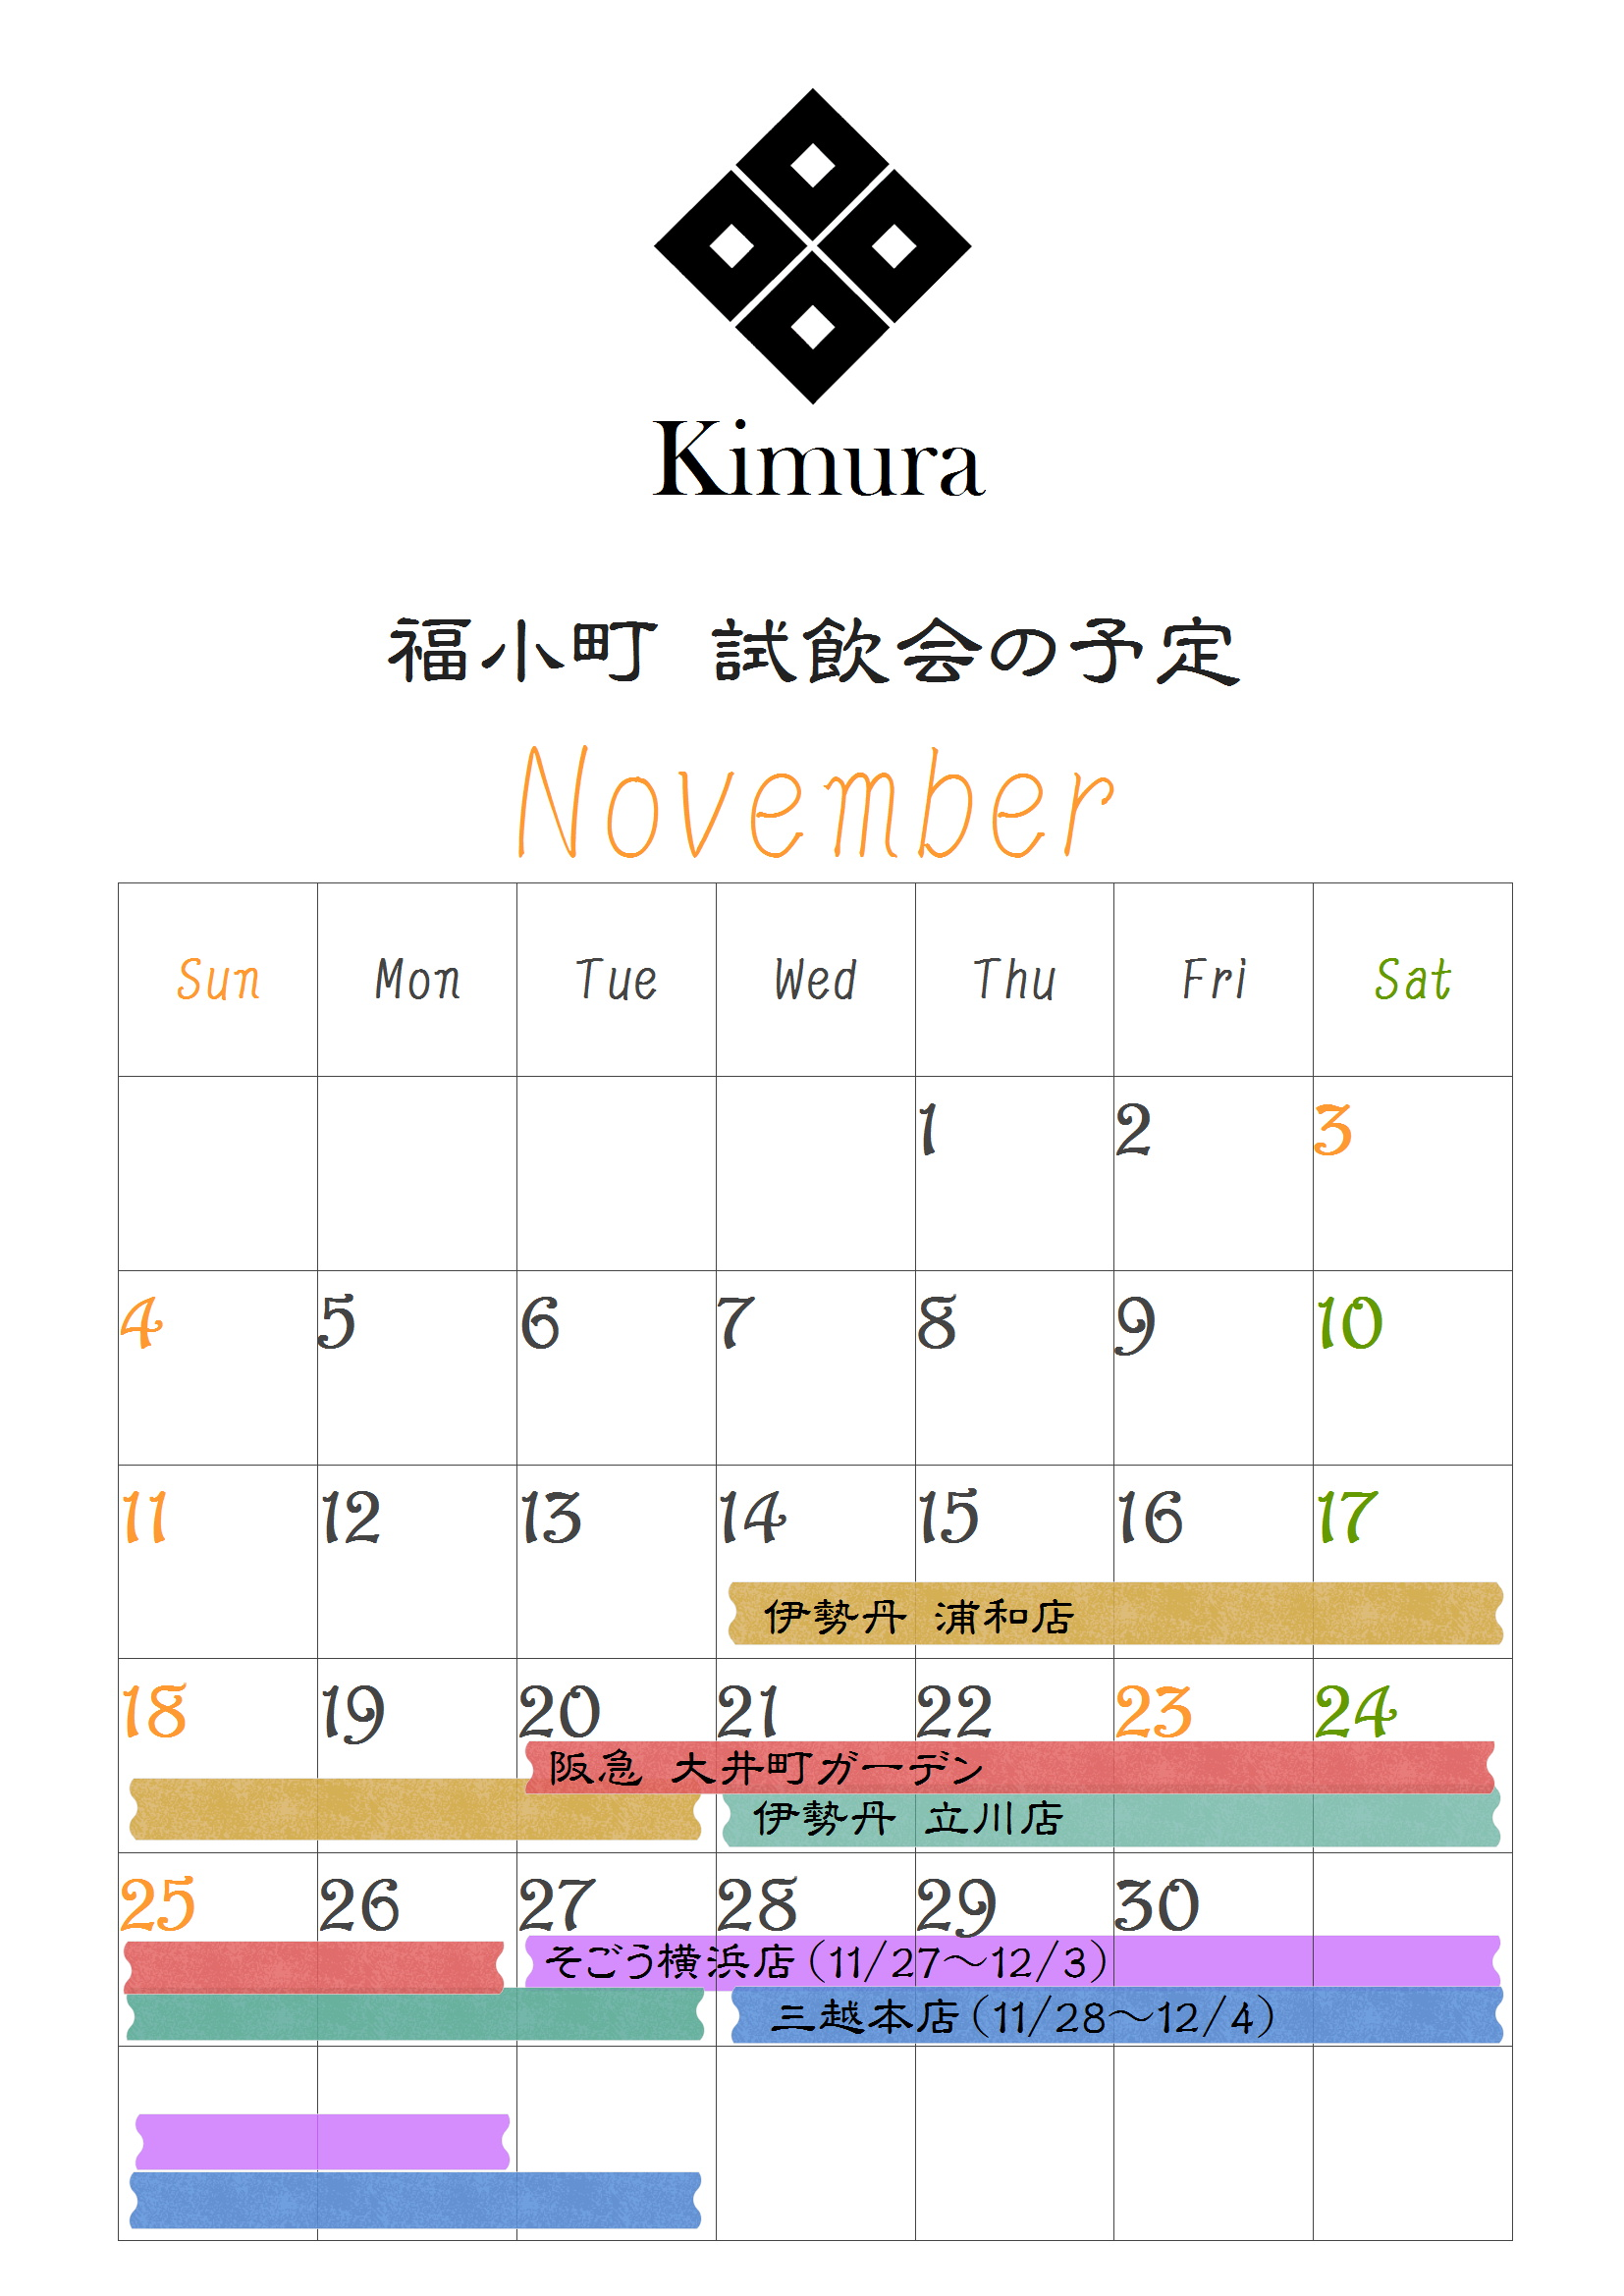 http://www.fukukomachi.com/blog/photo/20181116.JPG